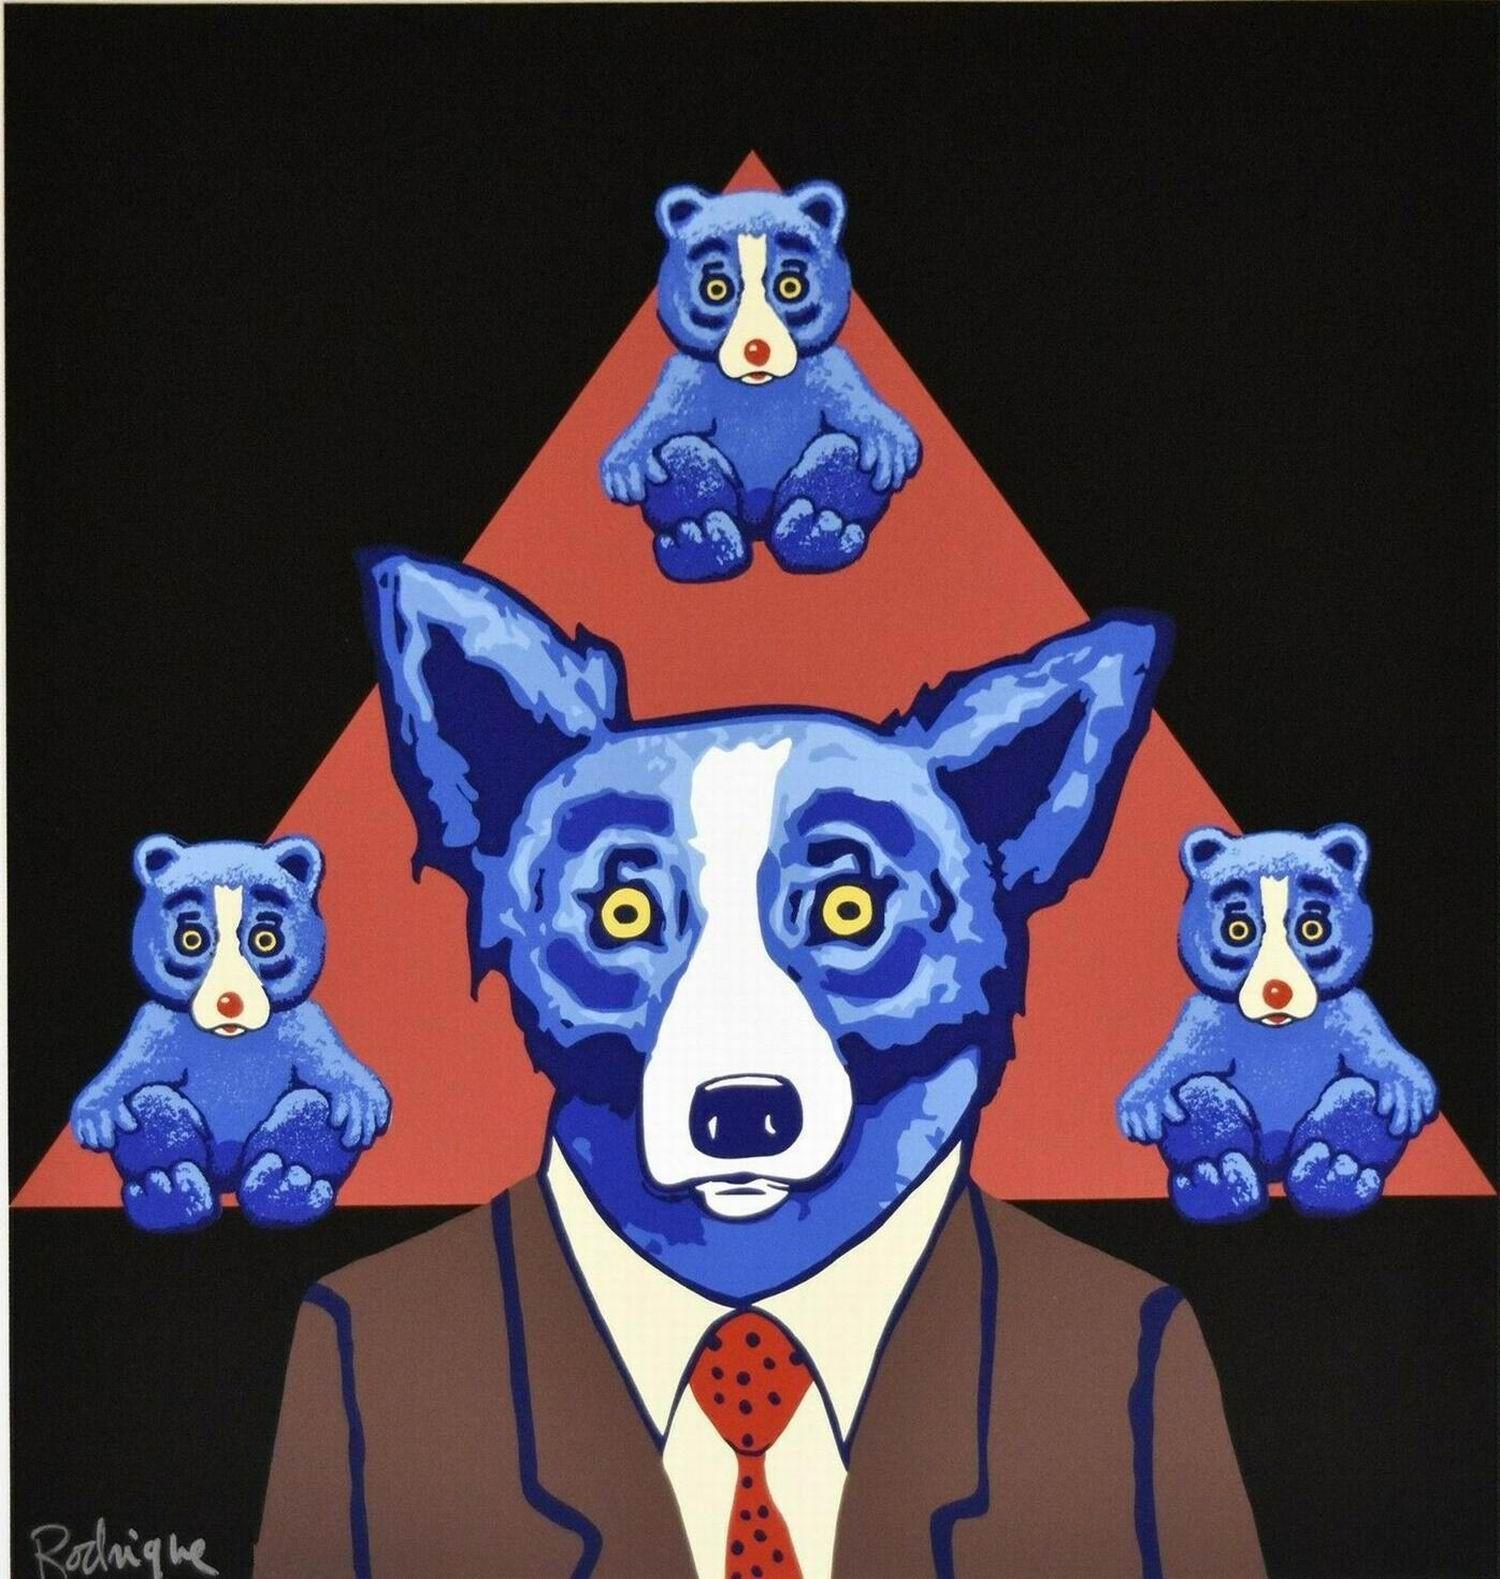 xa021 # Джордж Rodrigue голубой собаки Медведи сходству Home Decor ремесла / HD печати Картина маслом на холсте Wall Art Canvas картинки 200111